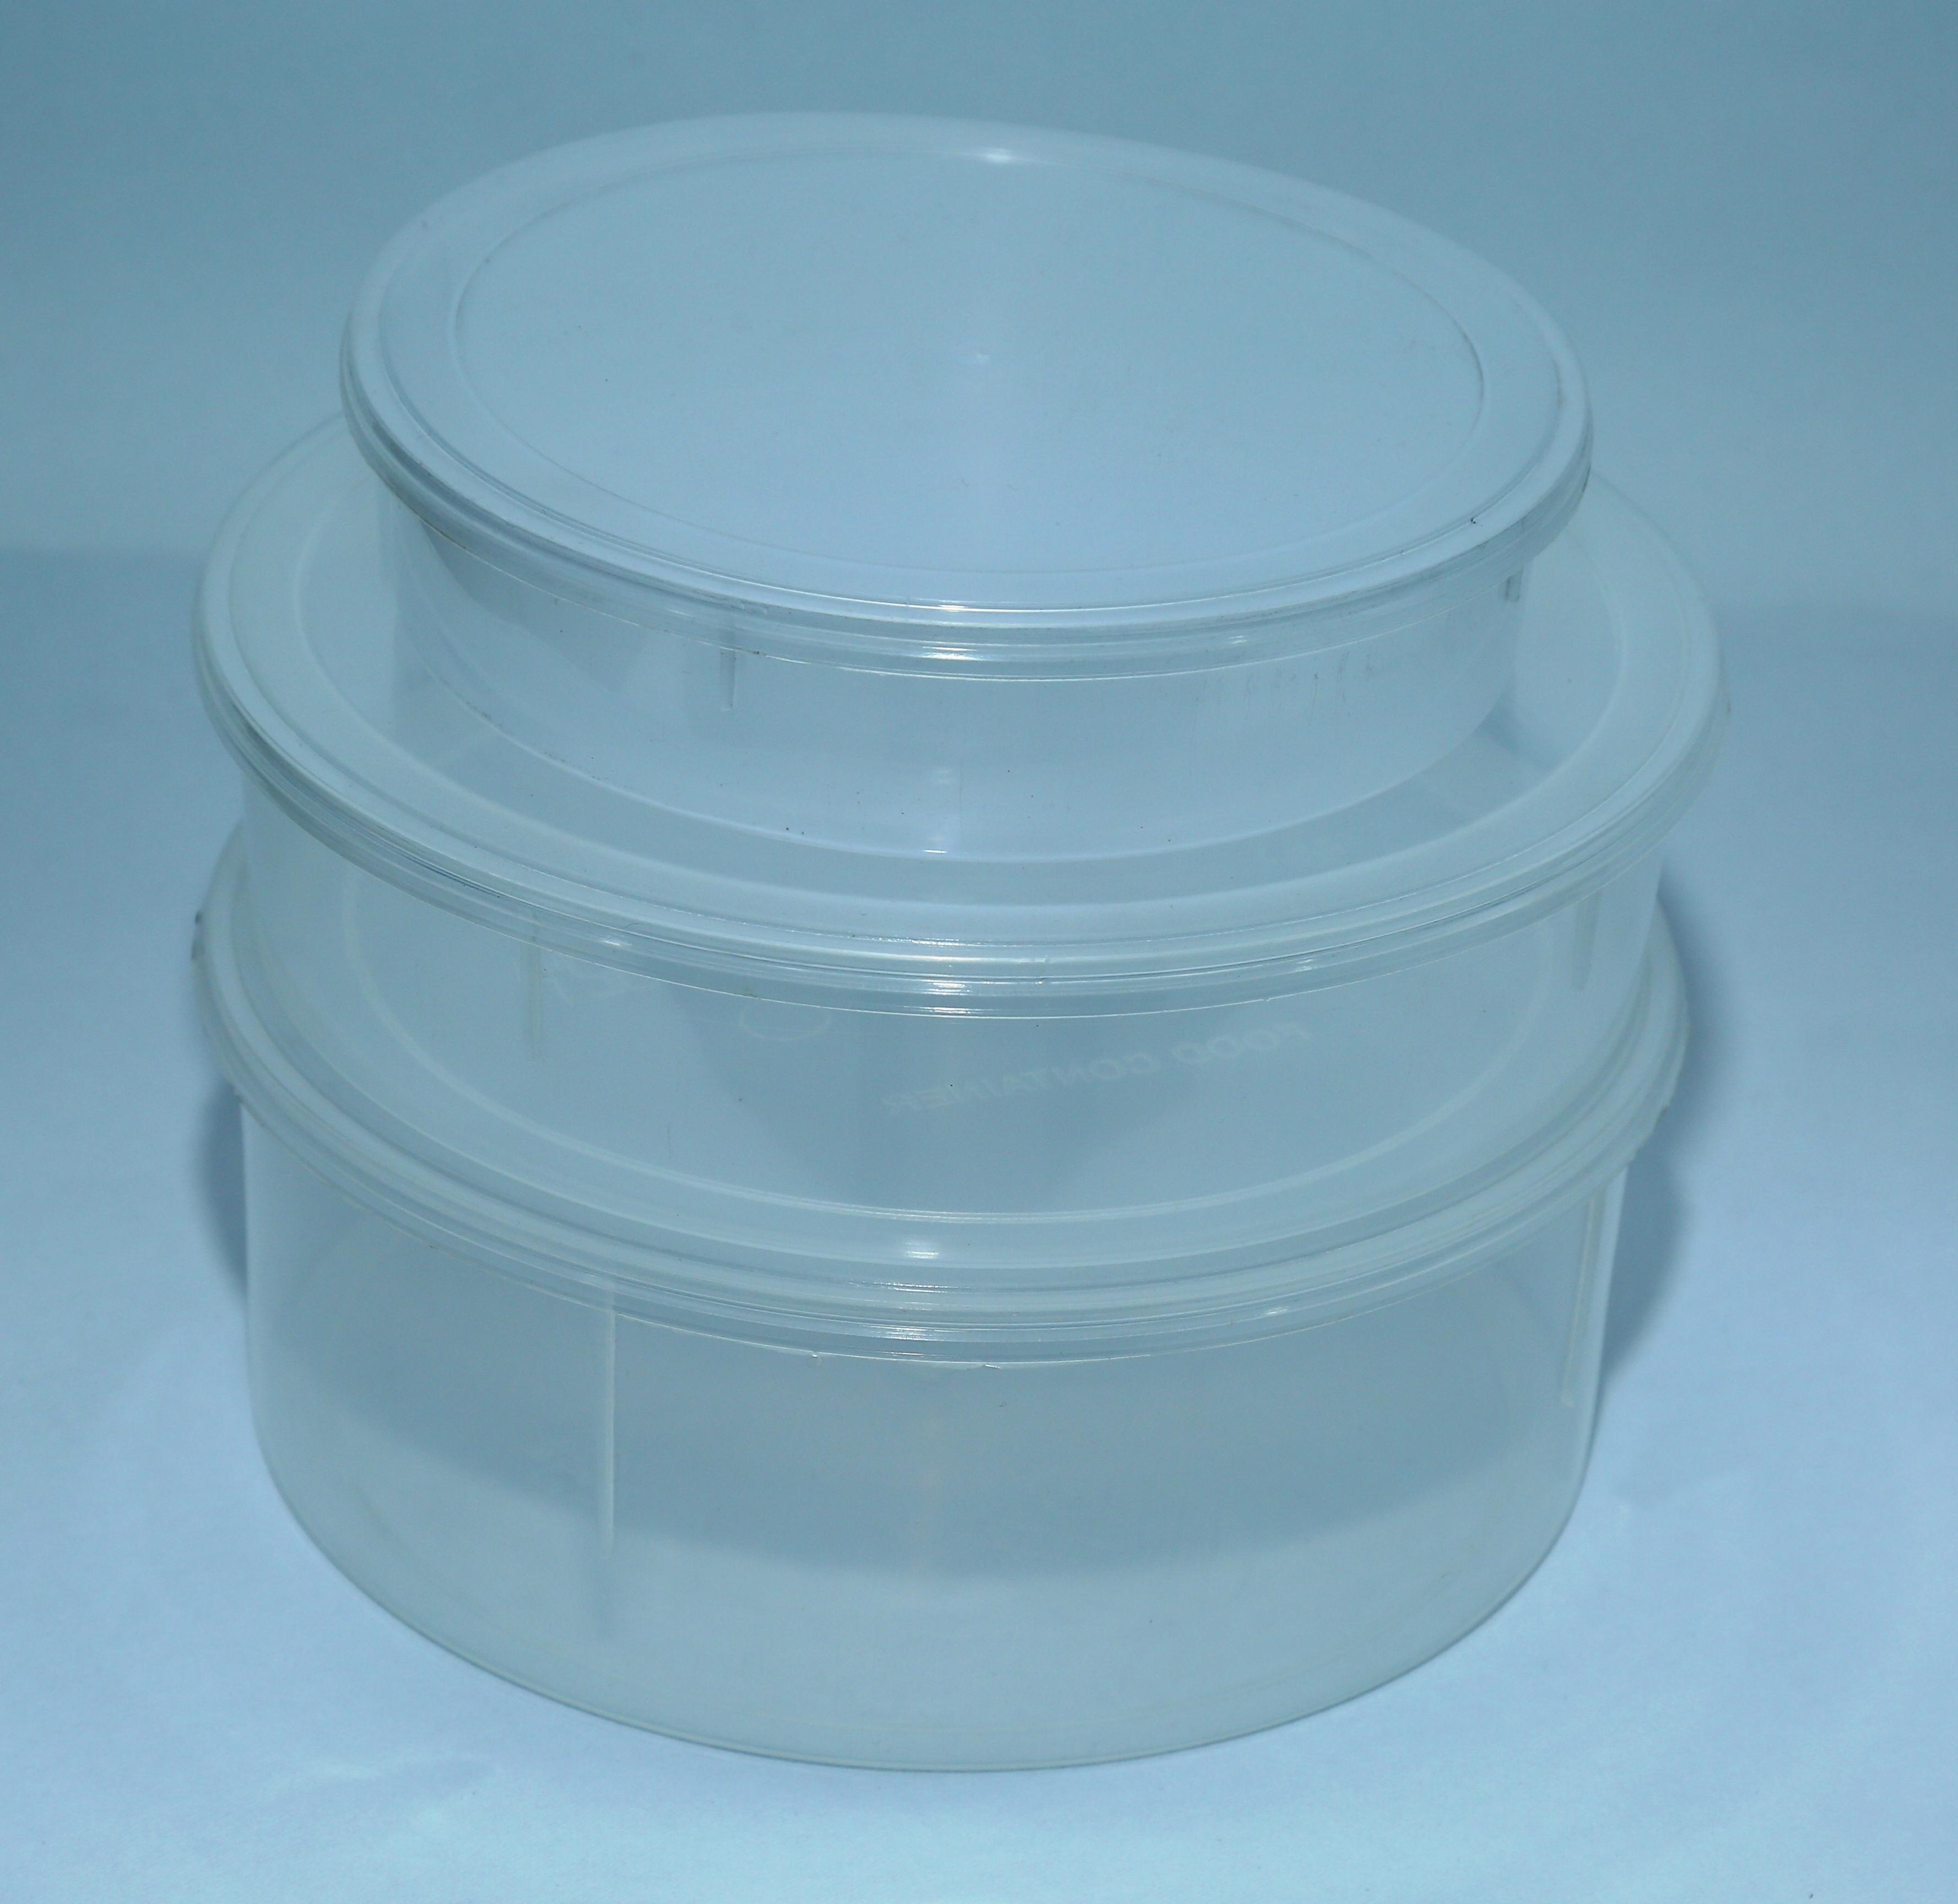 Khakhara Plastic Container